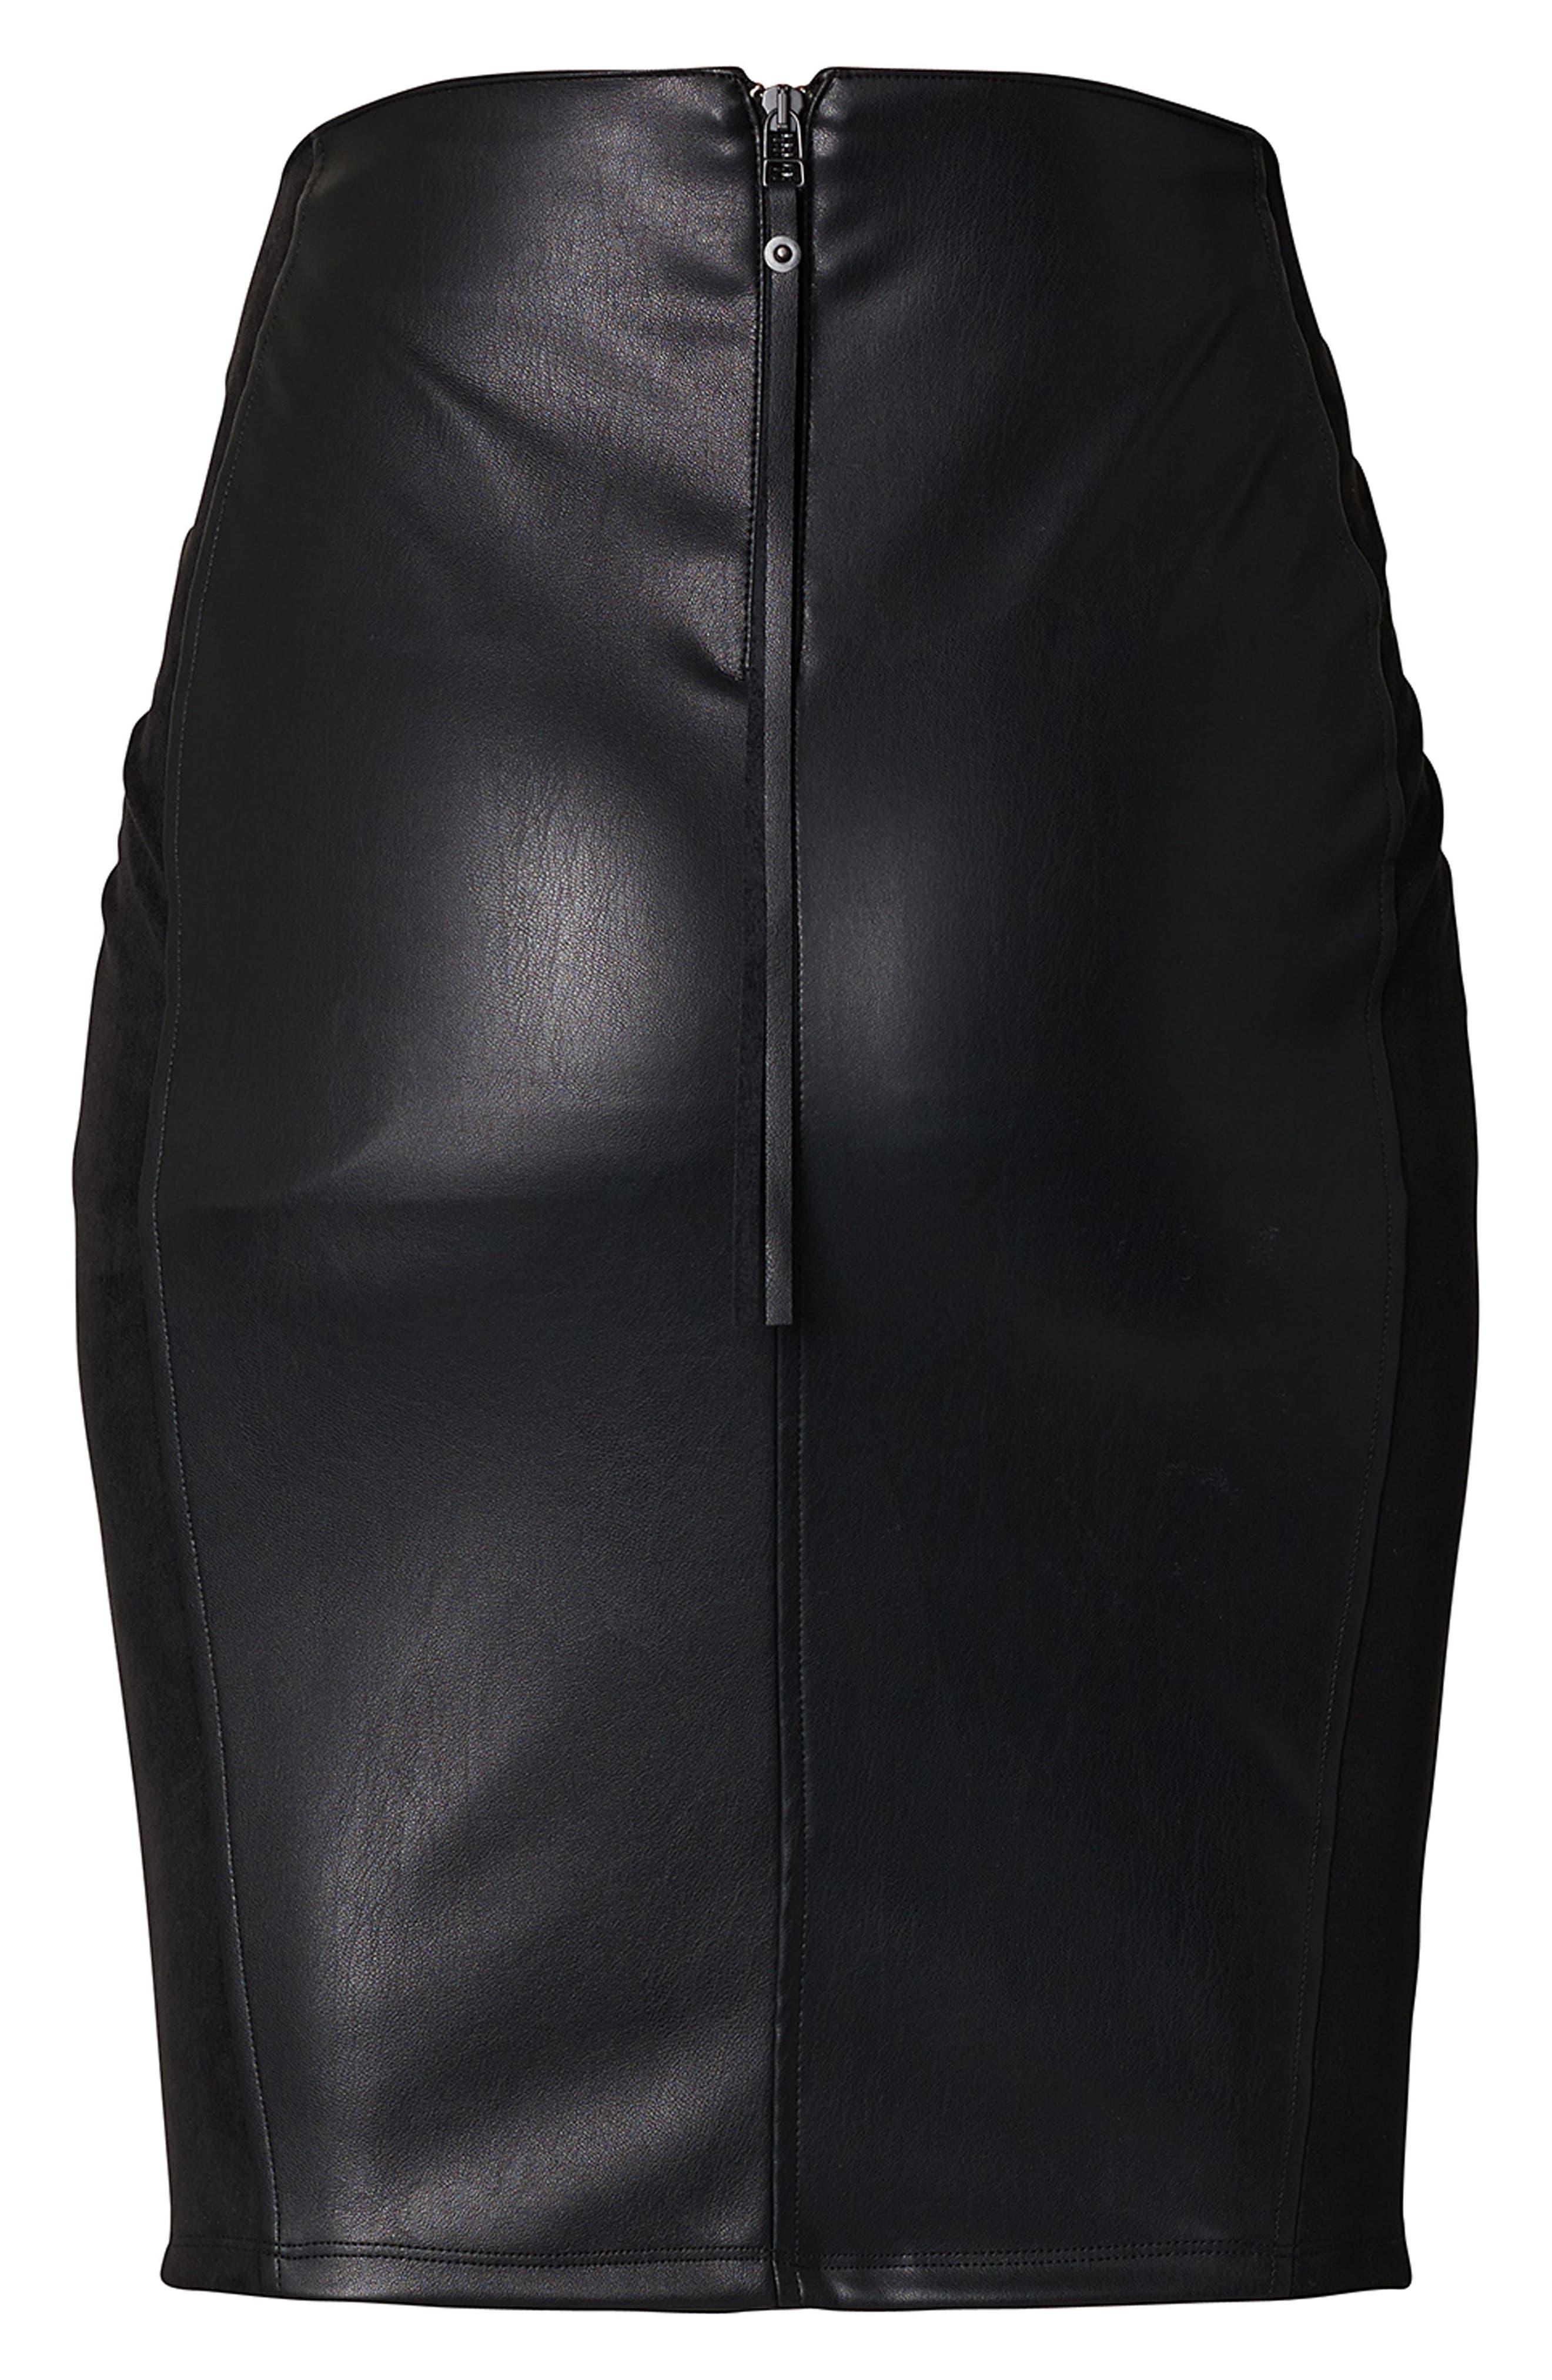 SUPERMOM,                             High Waist Faux Leather Skirt,                             Main thumbnail 1, color,                             001